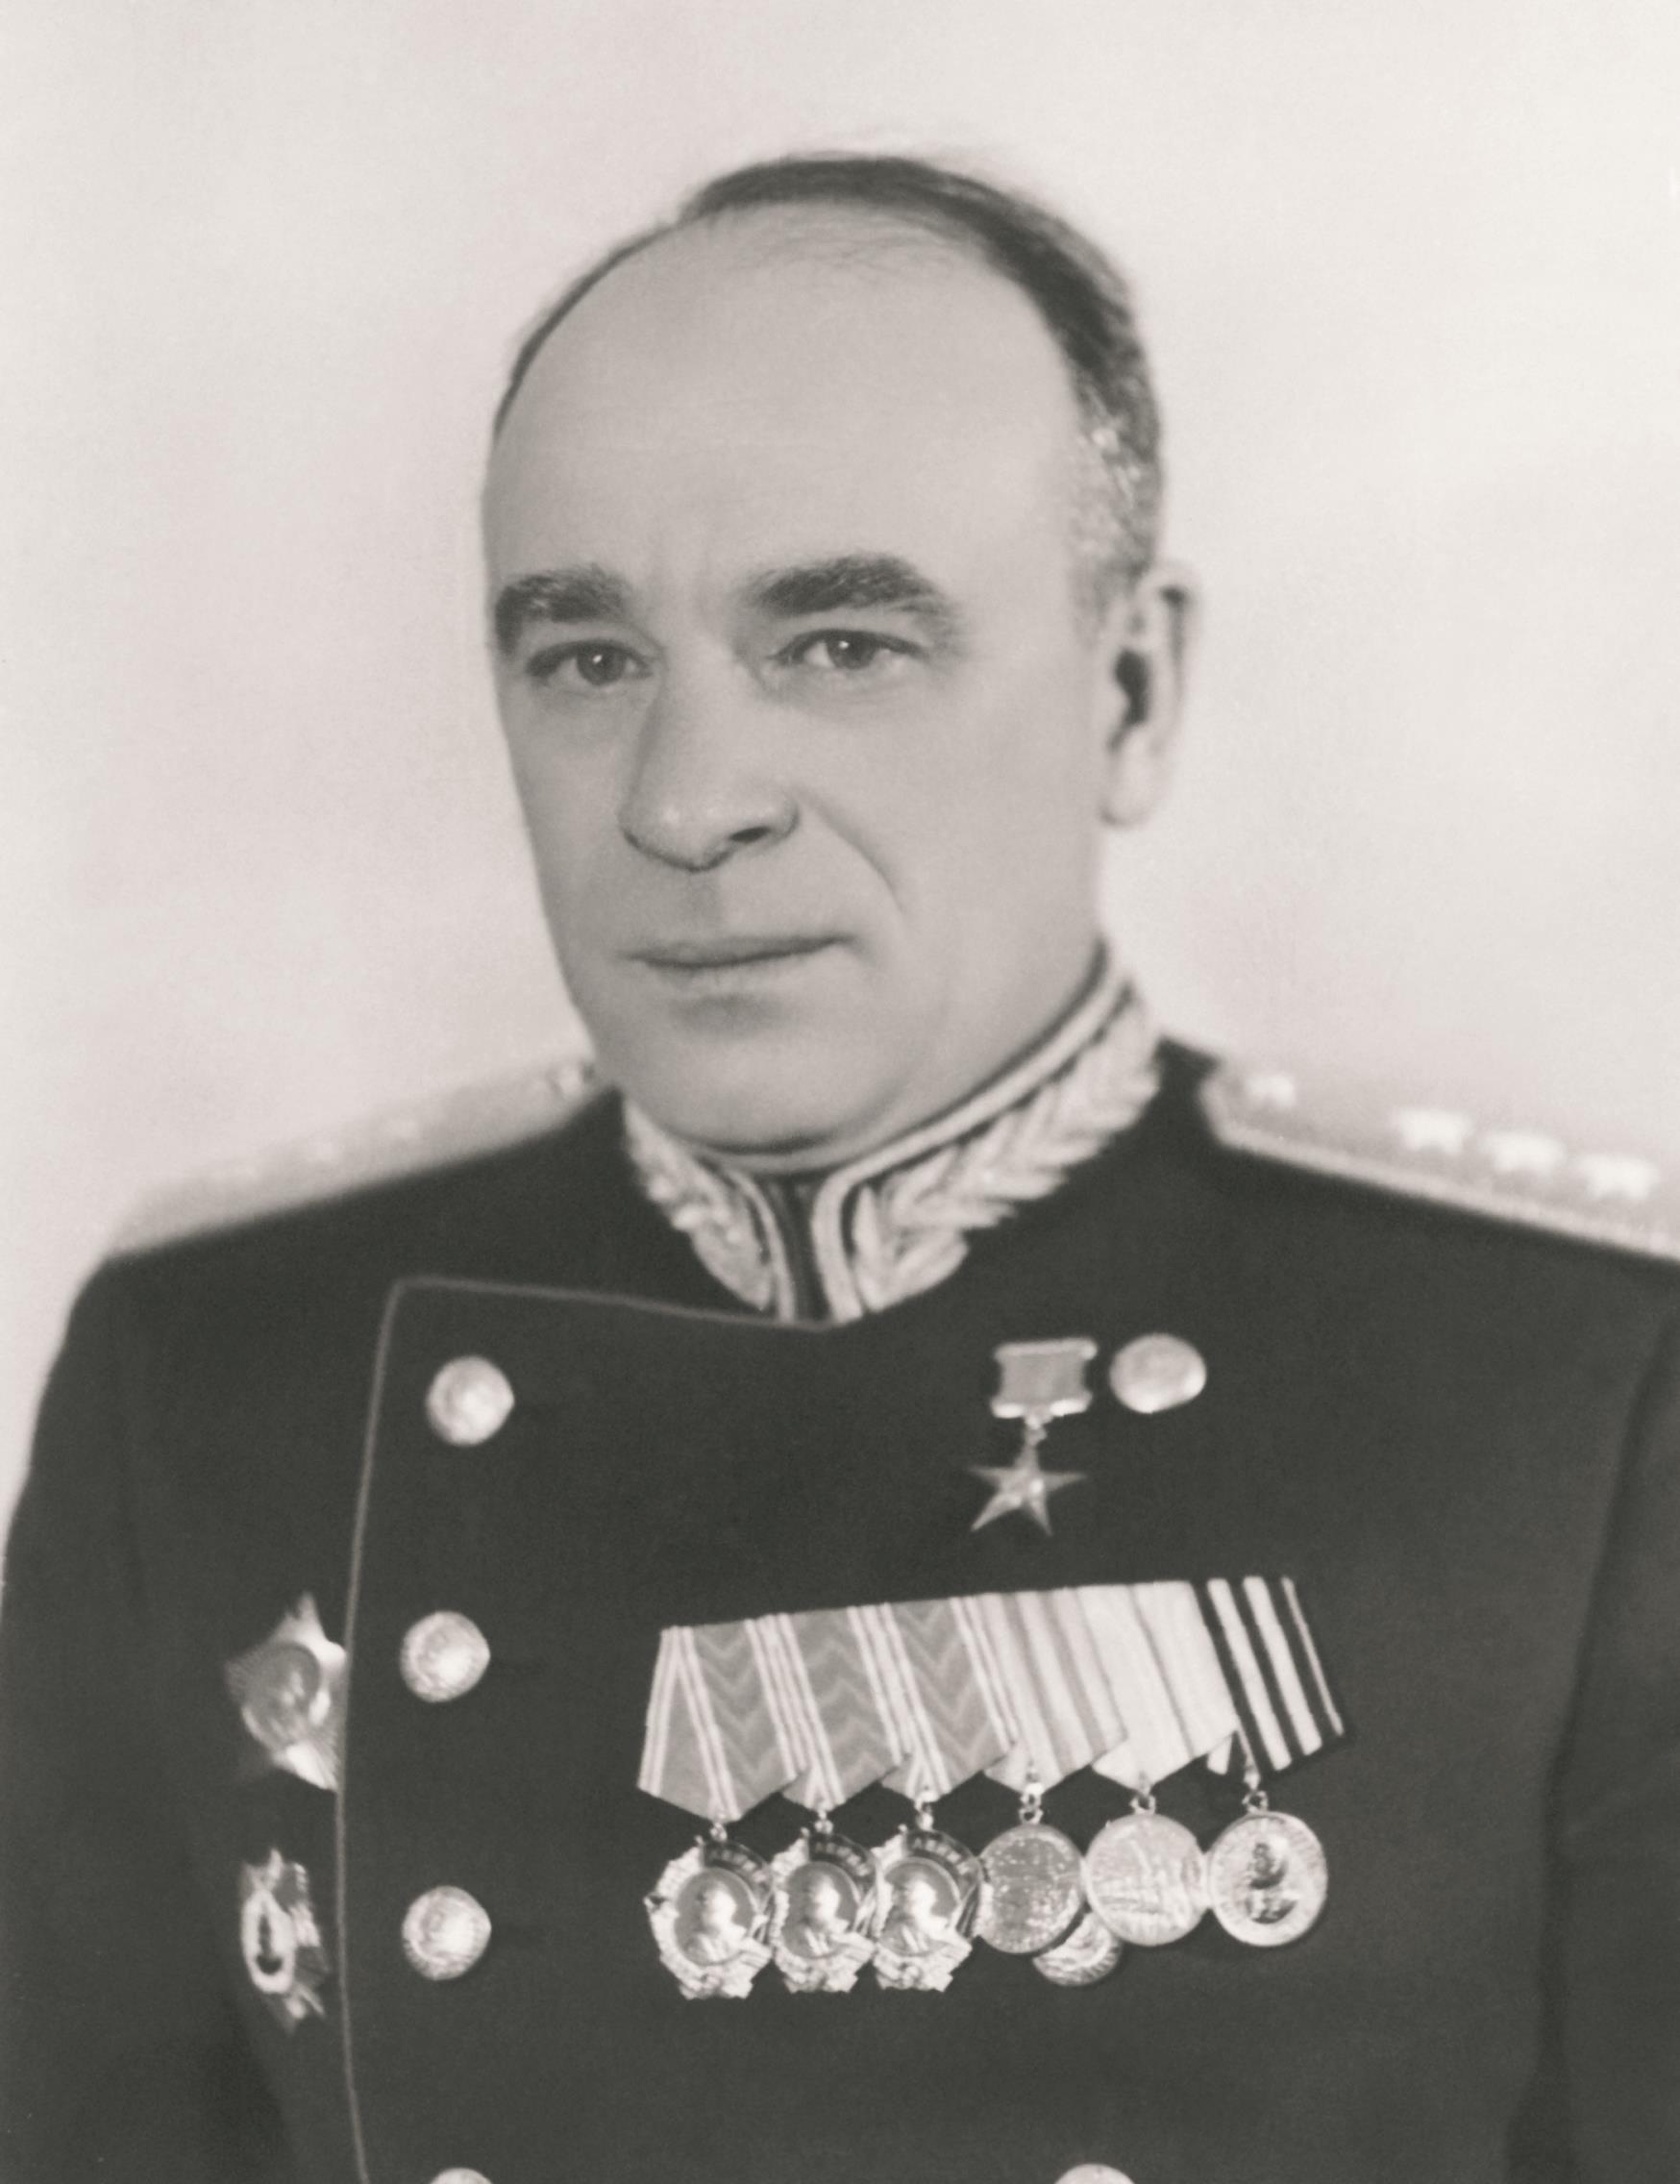 Вячеслав Малышев - организатор советского танкопрома